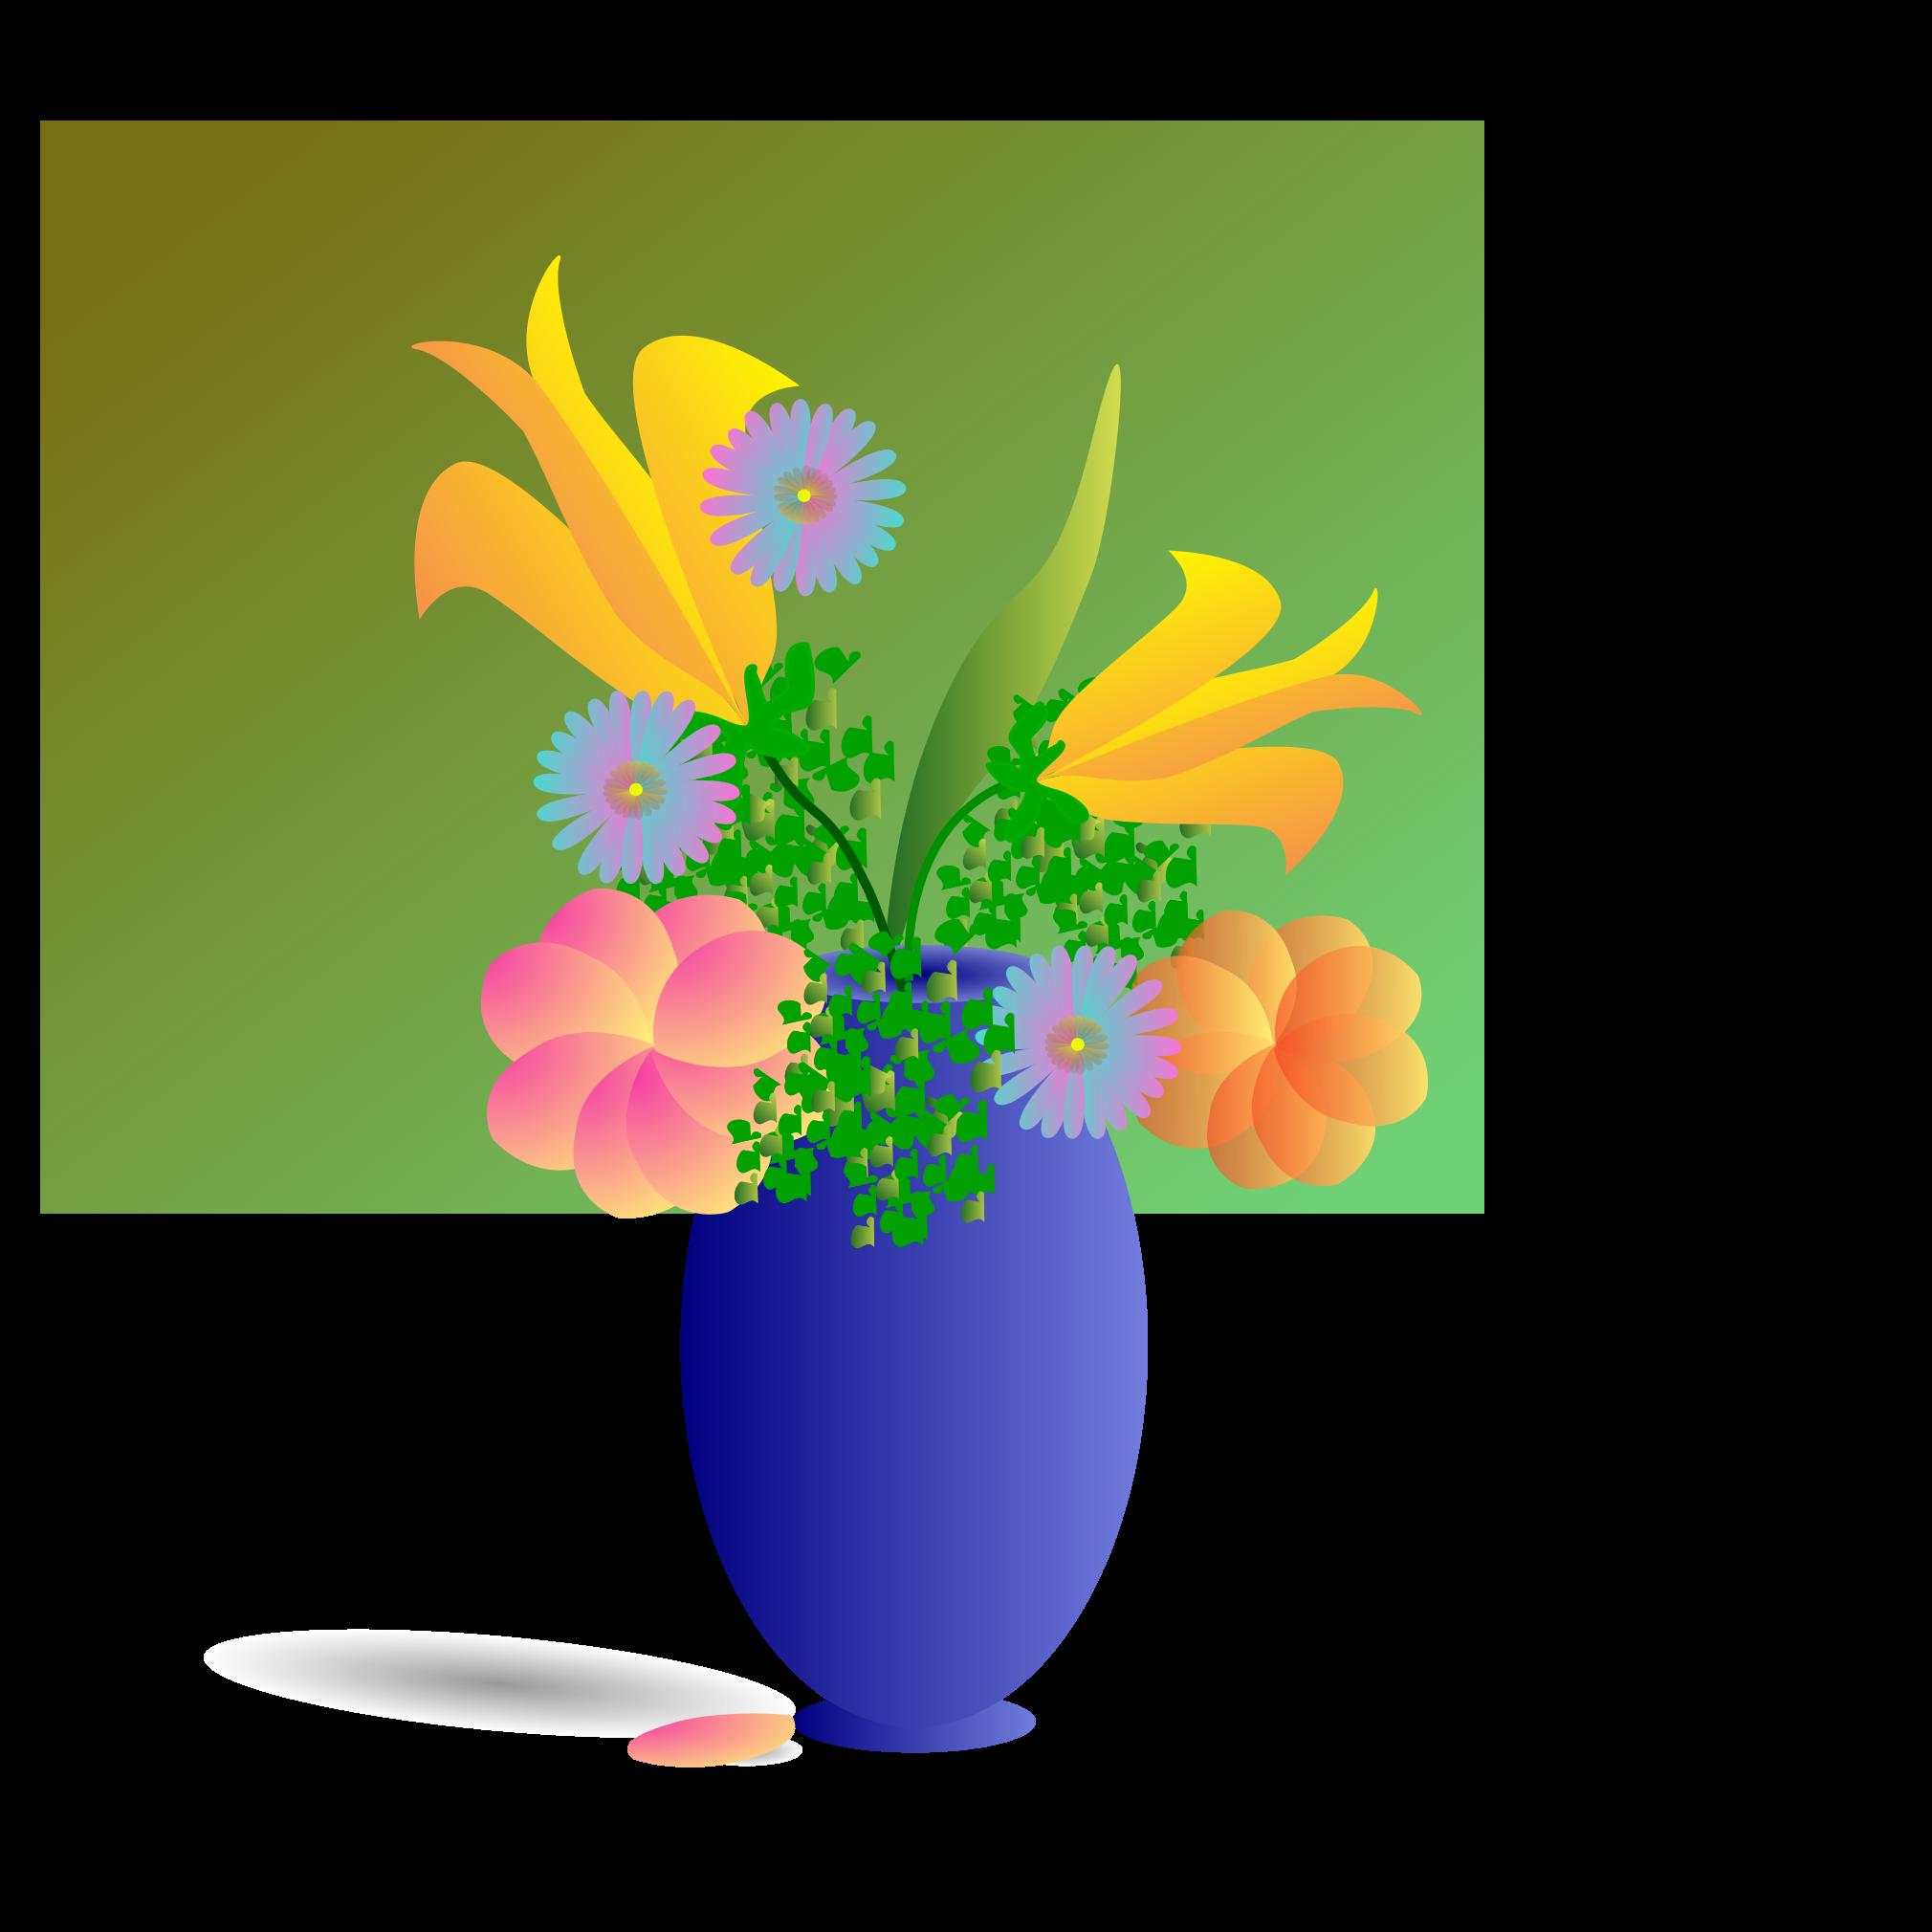 Clipart Bouquet Of Flowers